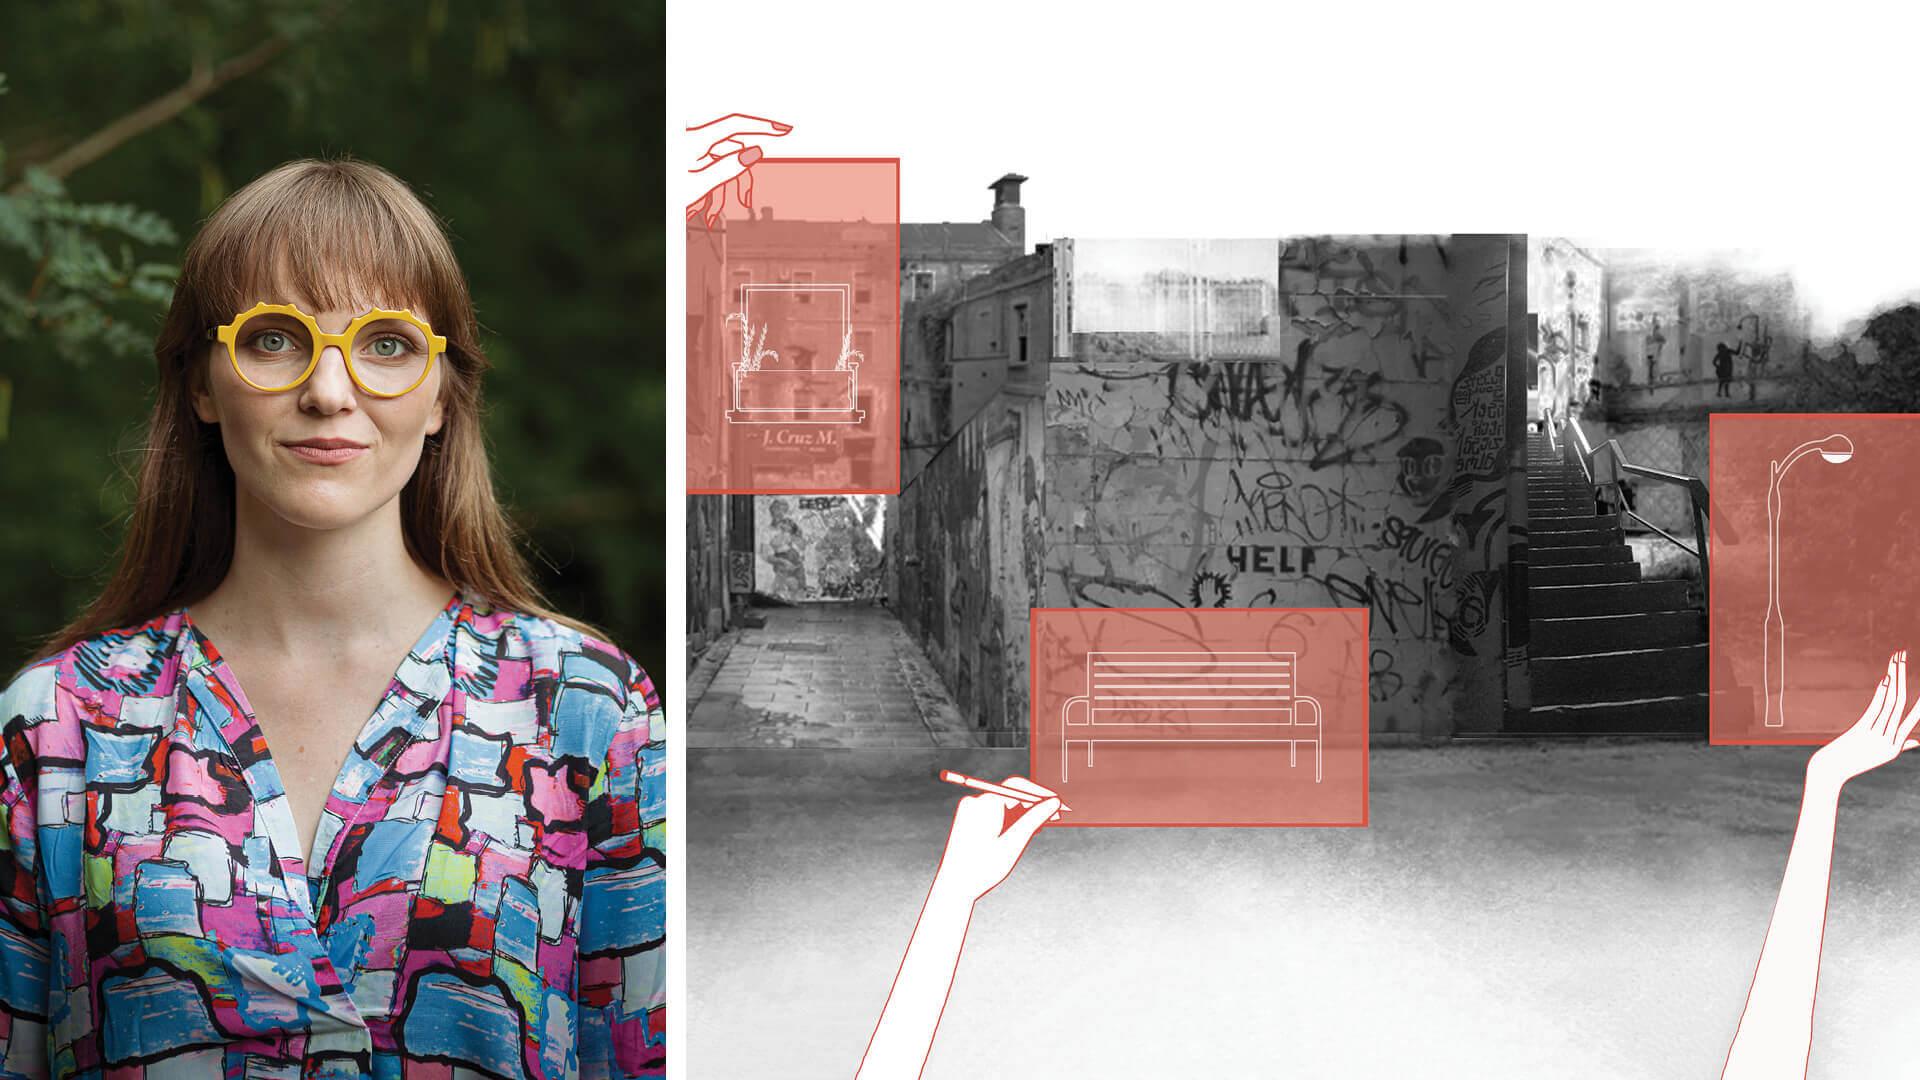 2021 RIBA Norman Foster Travelling Scholarship awarded to Weronika Zdziarska